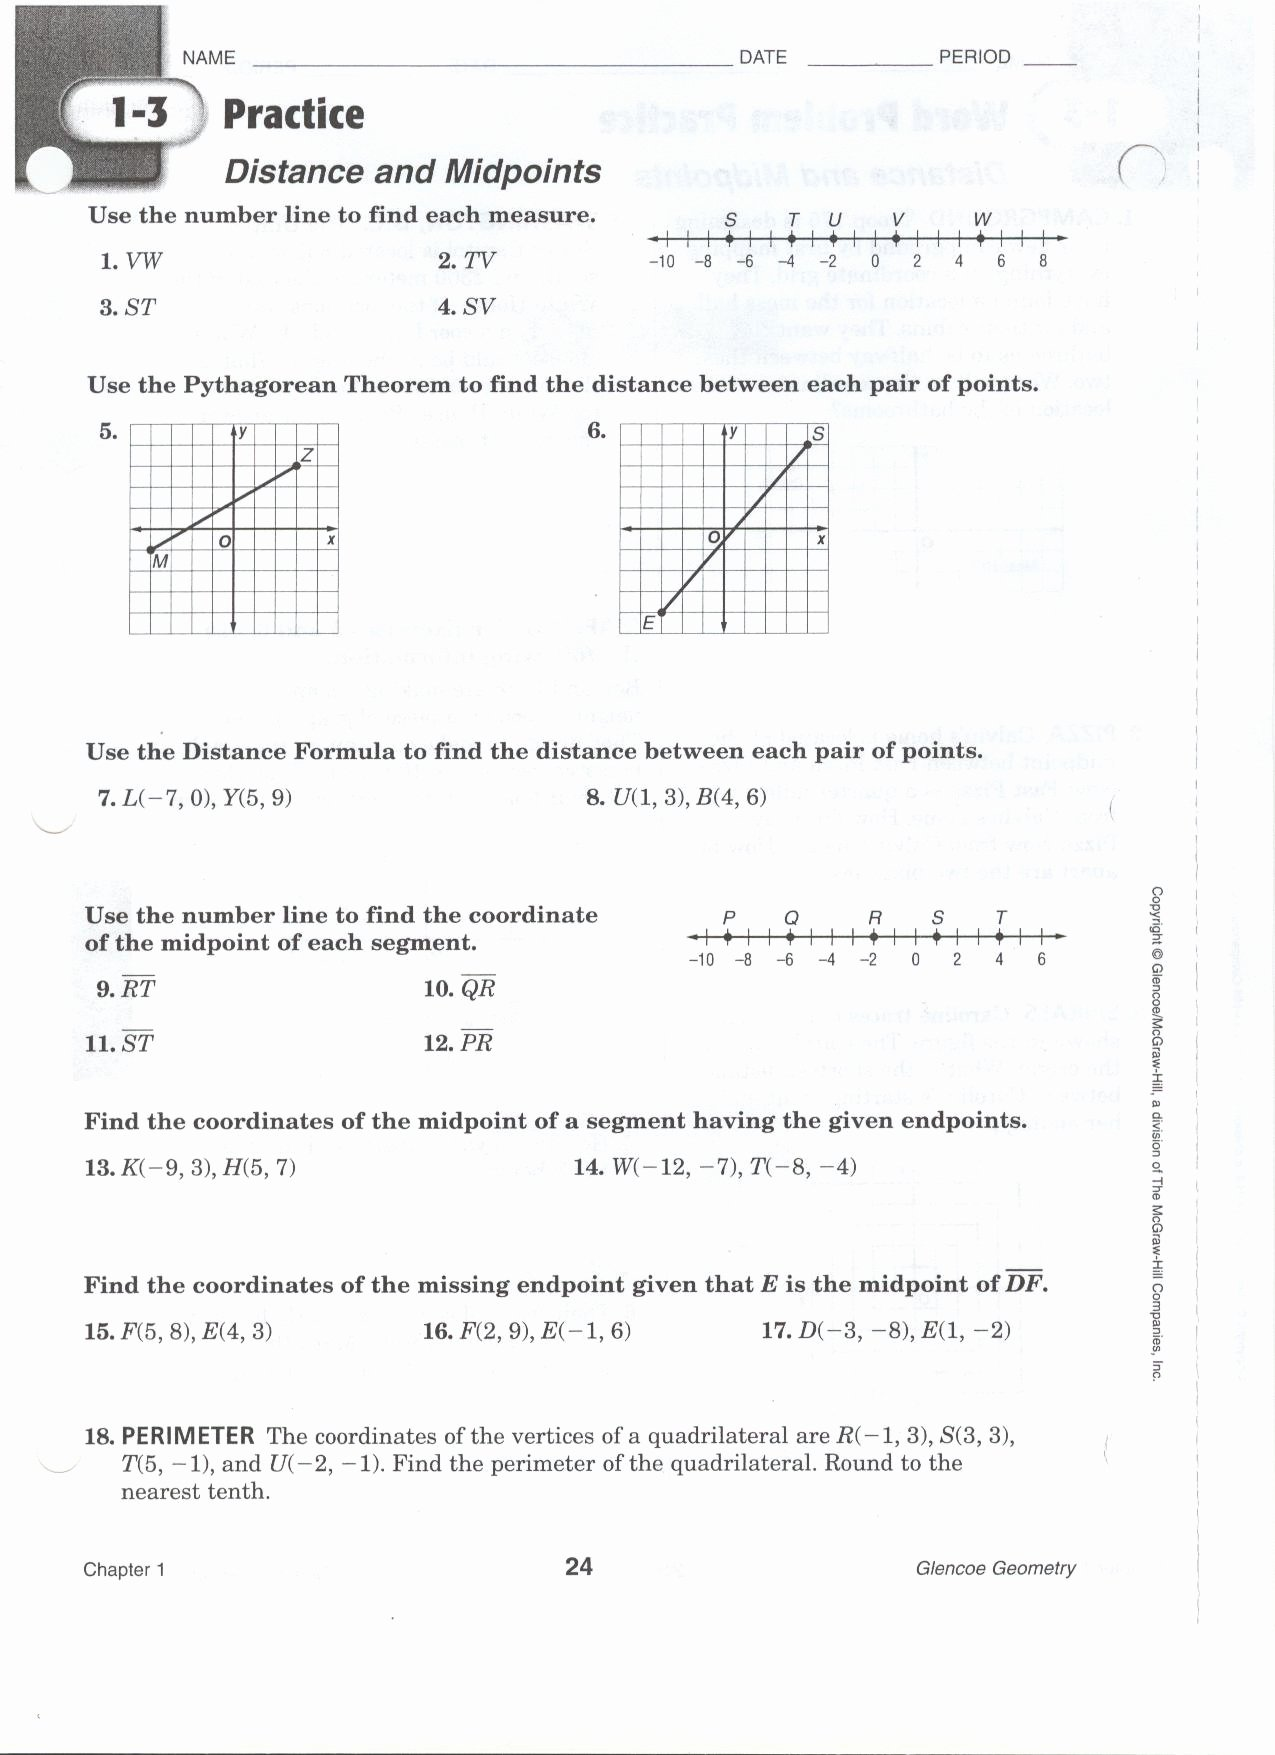 Distance formula Word Problems Worksheet New Worksheet Midpoint and Distance Worksheet Grass Fedjp